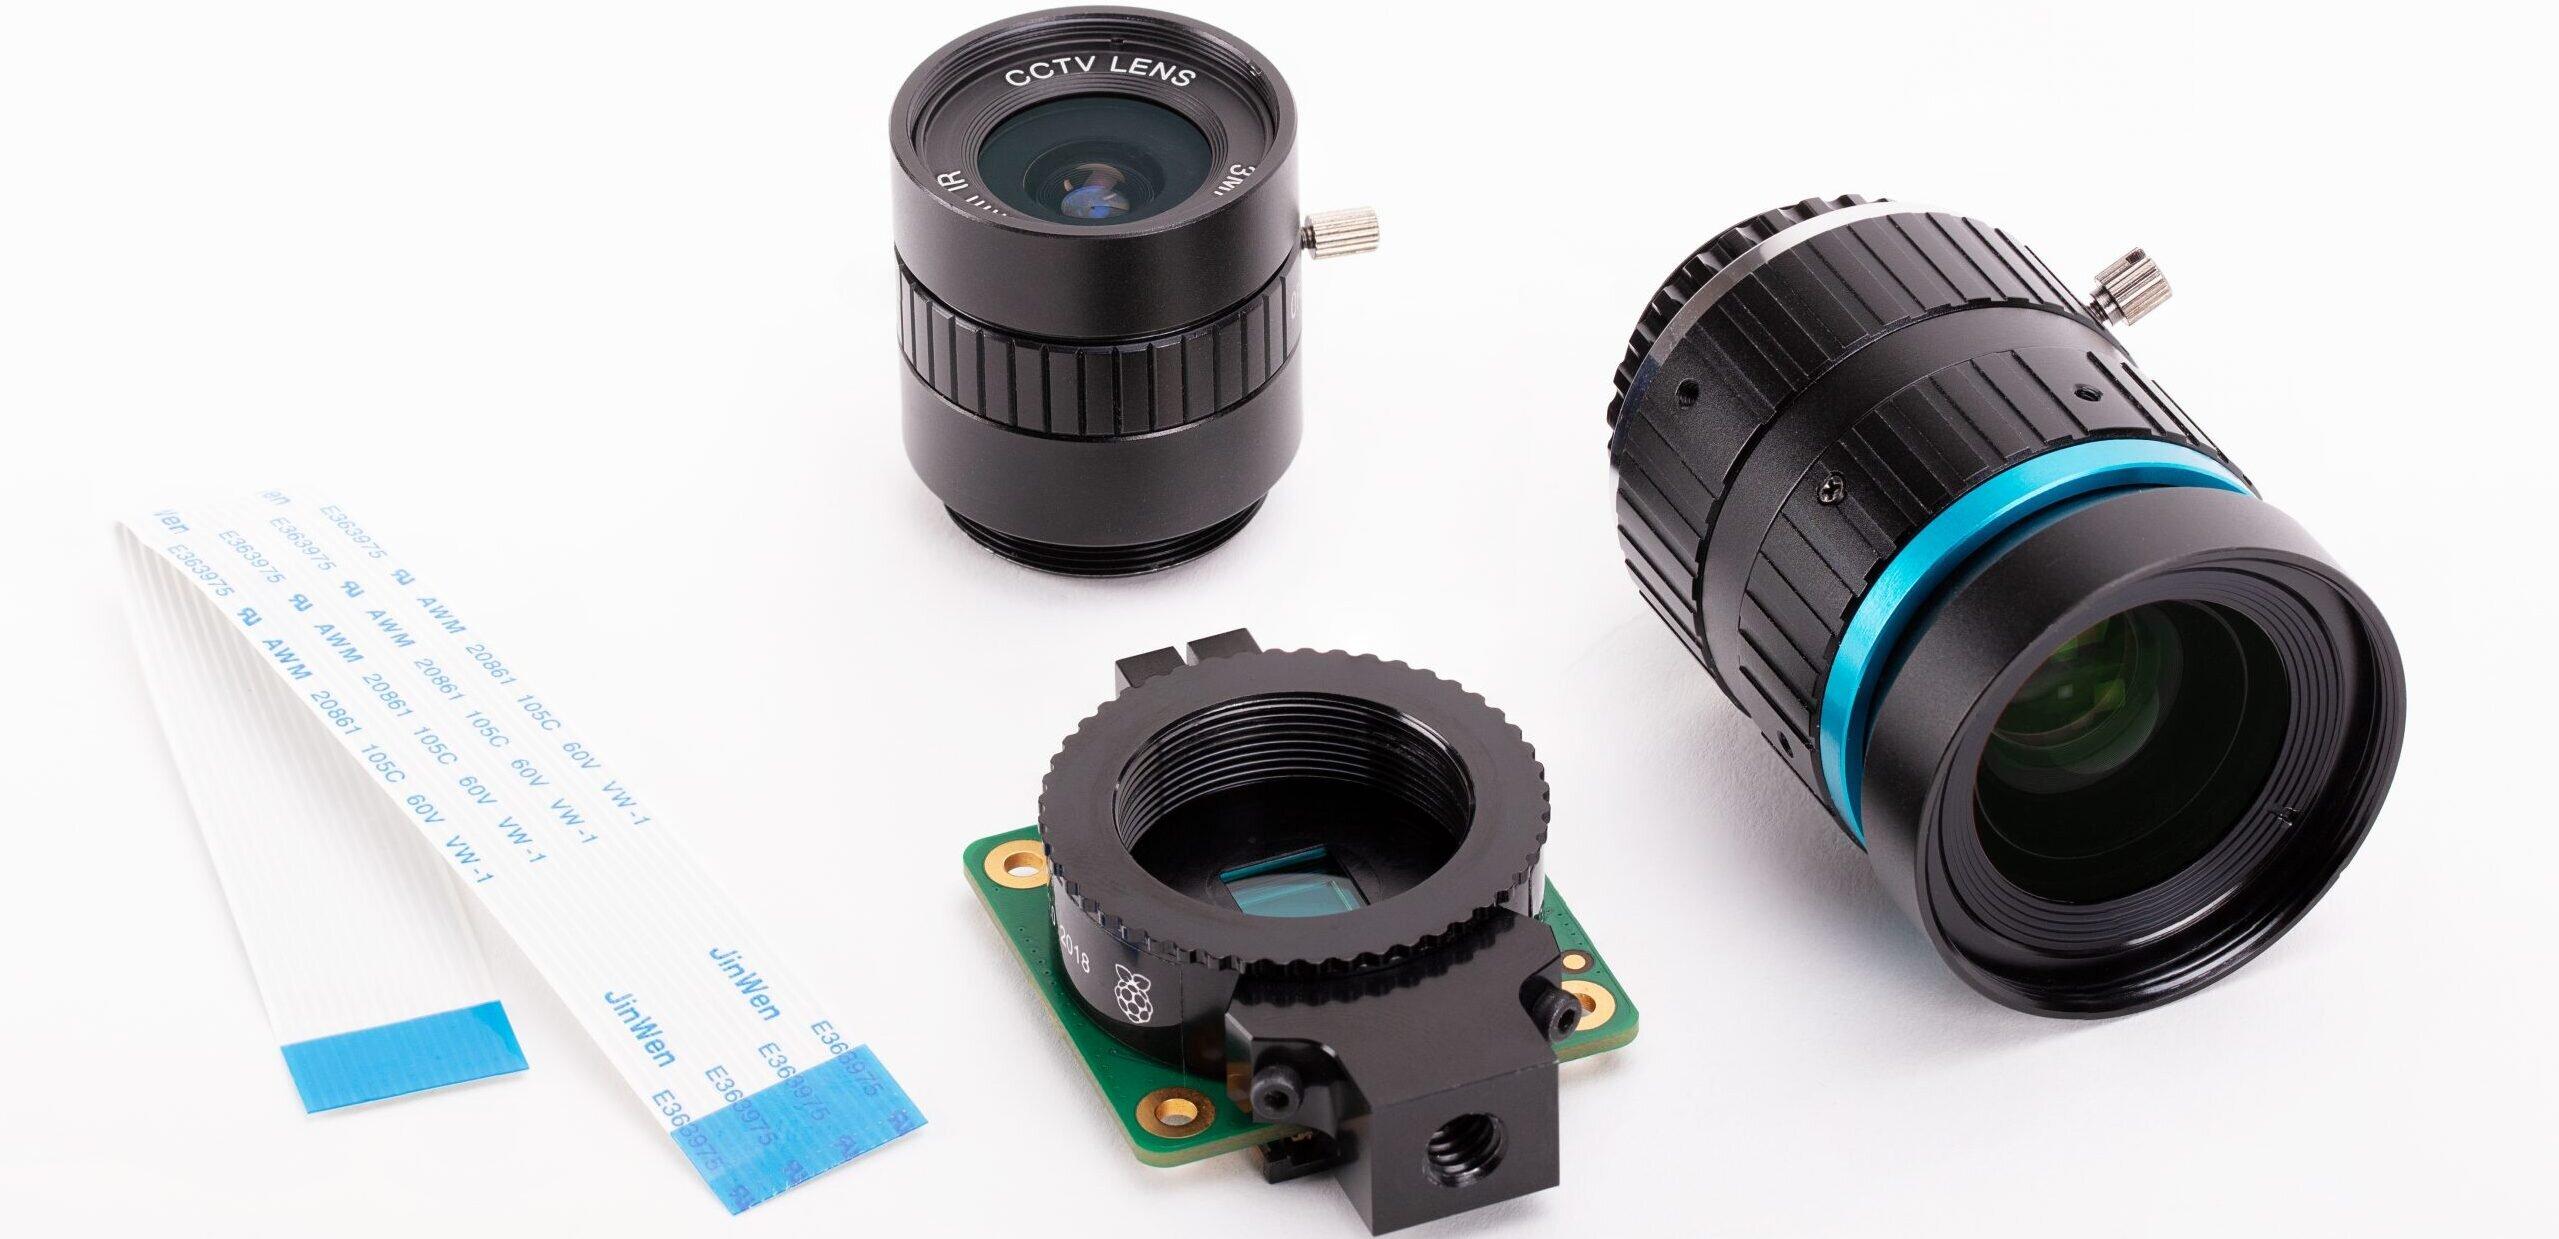 Rasbperry Pi : une HQ Camera de 12,3 Mpixels à 57 euros, avec objectifs interchangeables